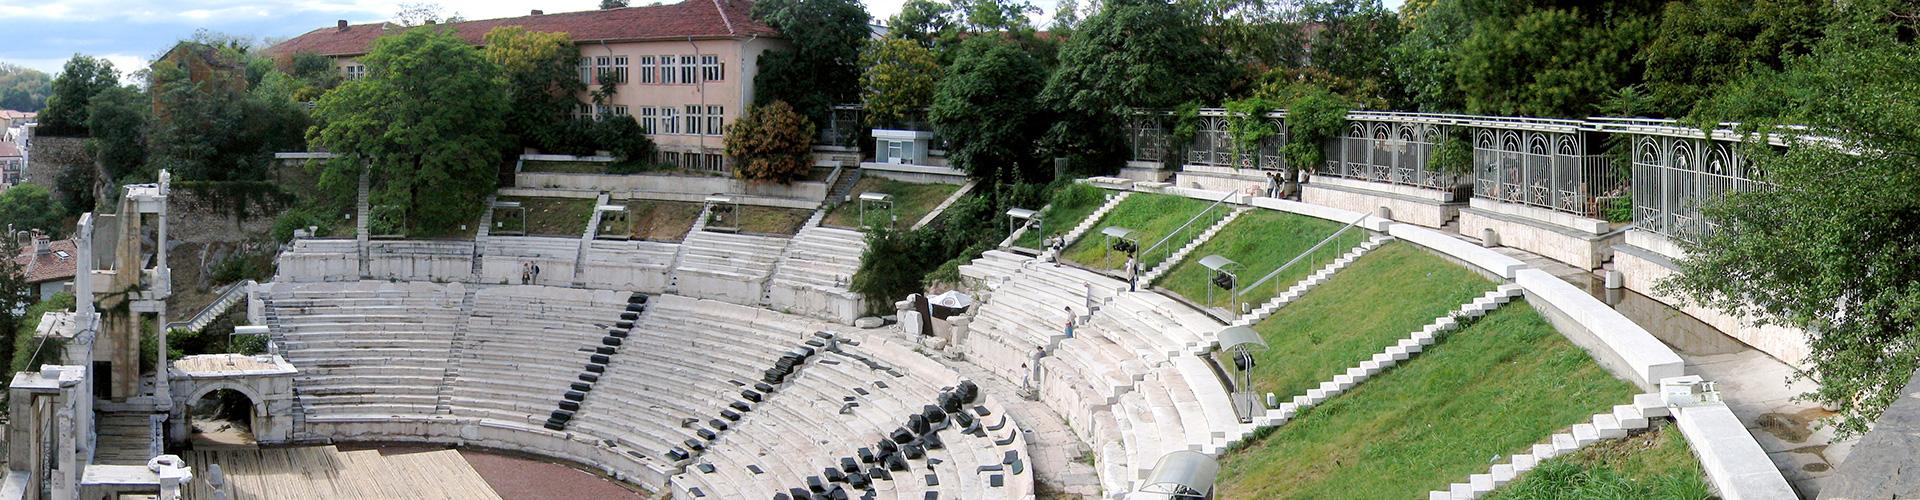 TransferTaxi-EUROPE | Antique_Theater-plovdiv-by-mirchovski - TransferTaxi-EUROPE